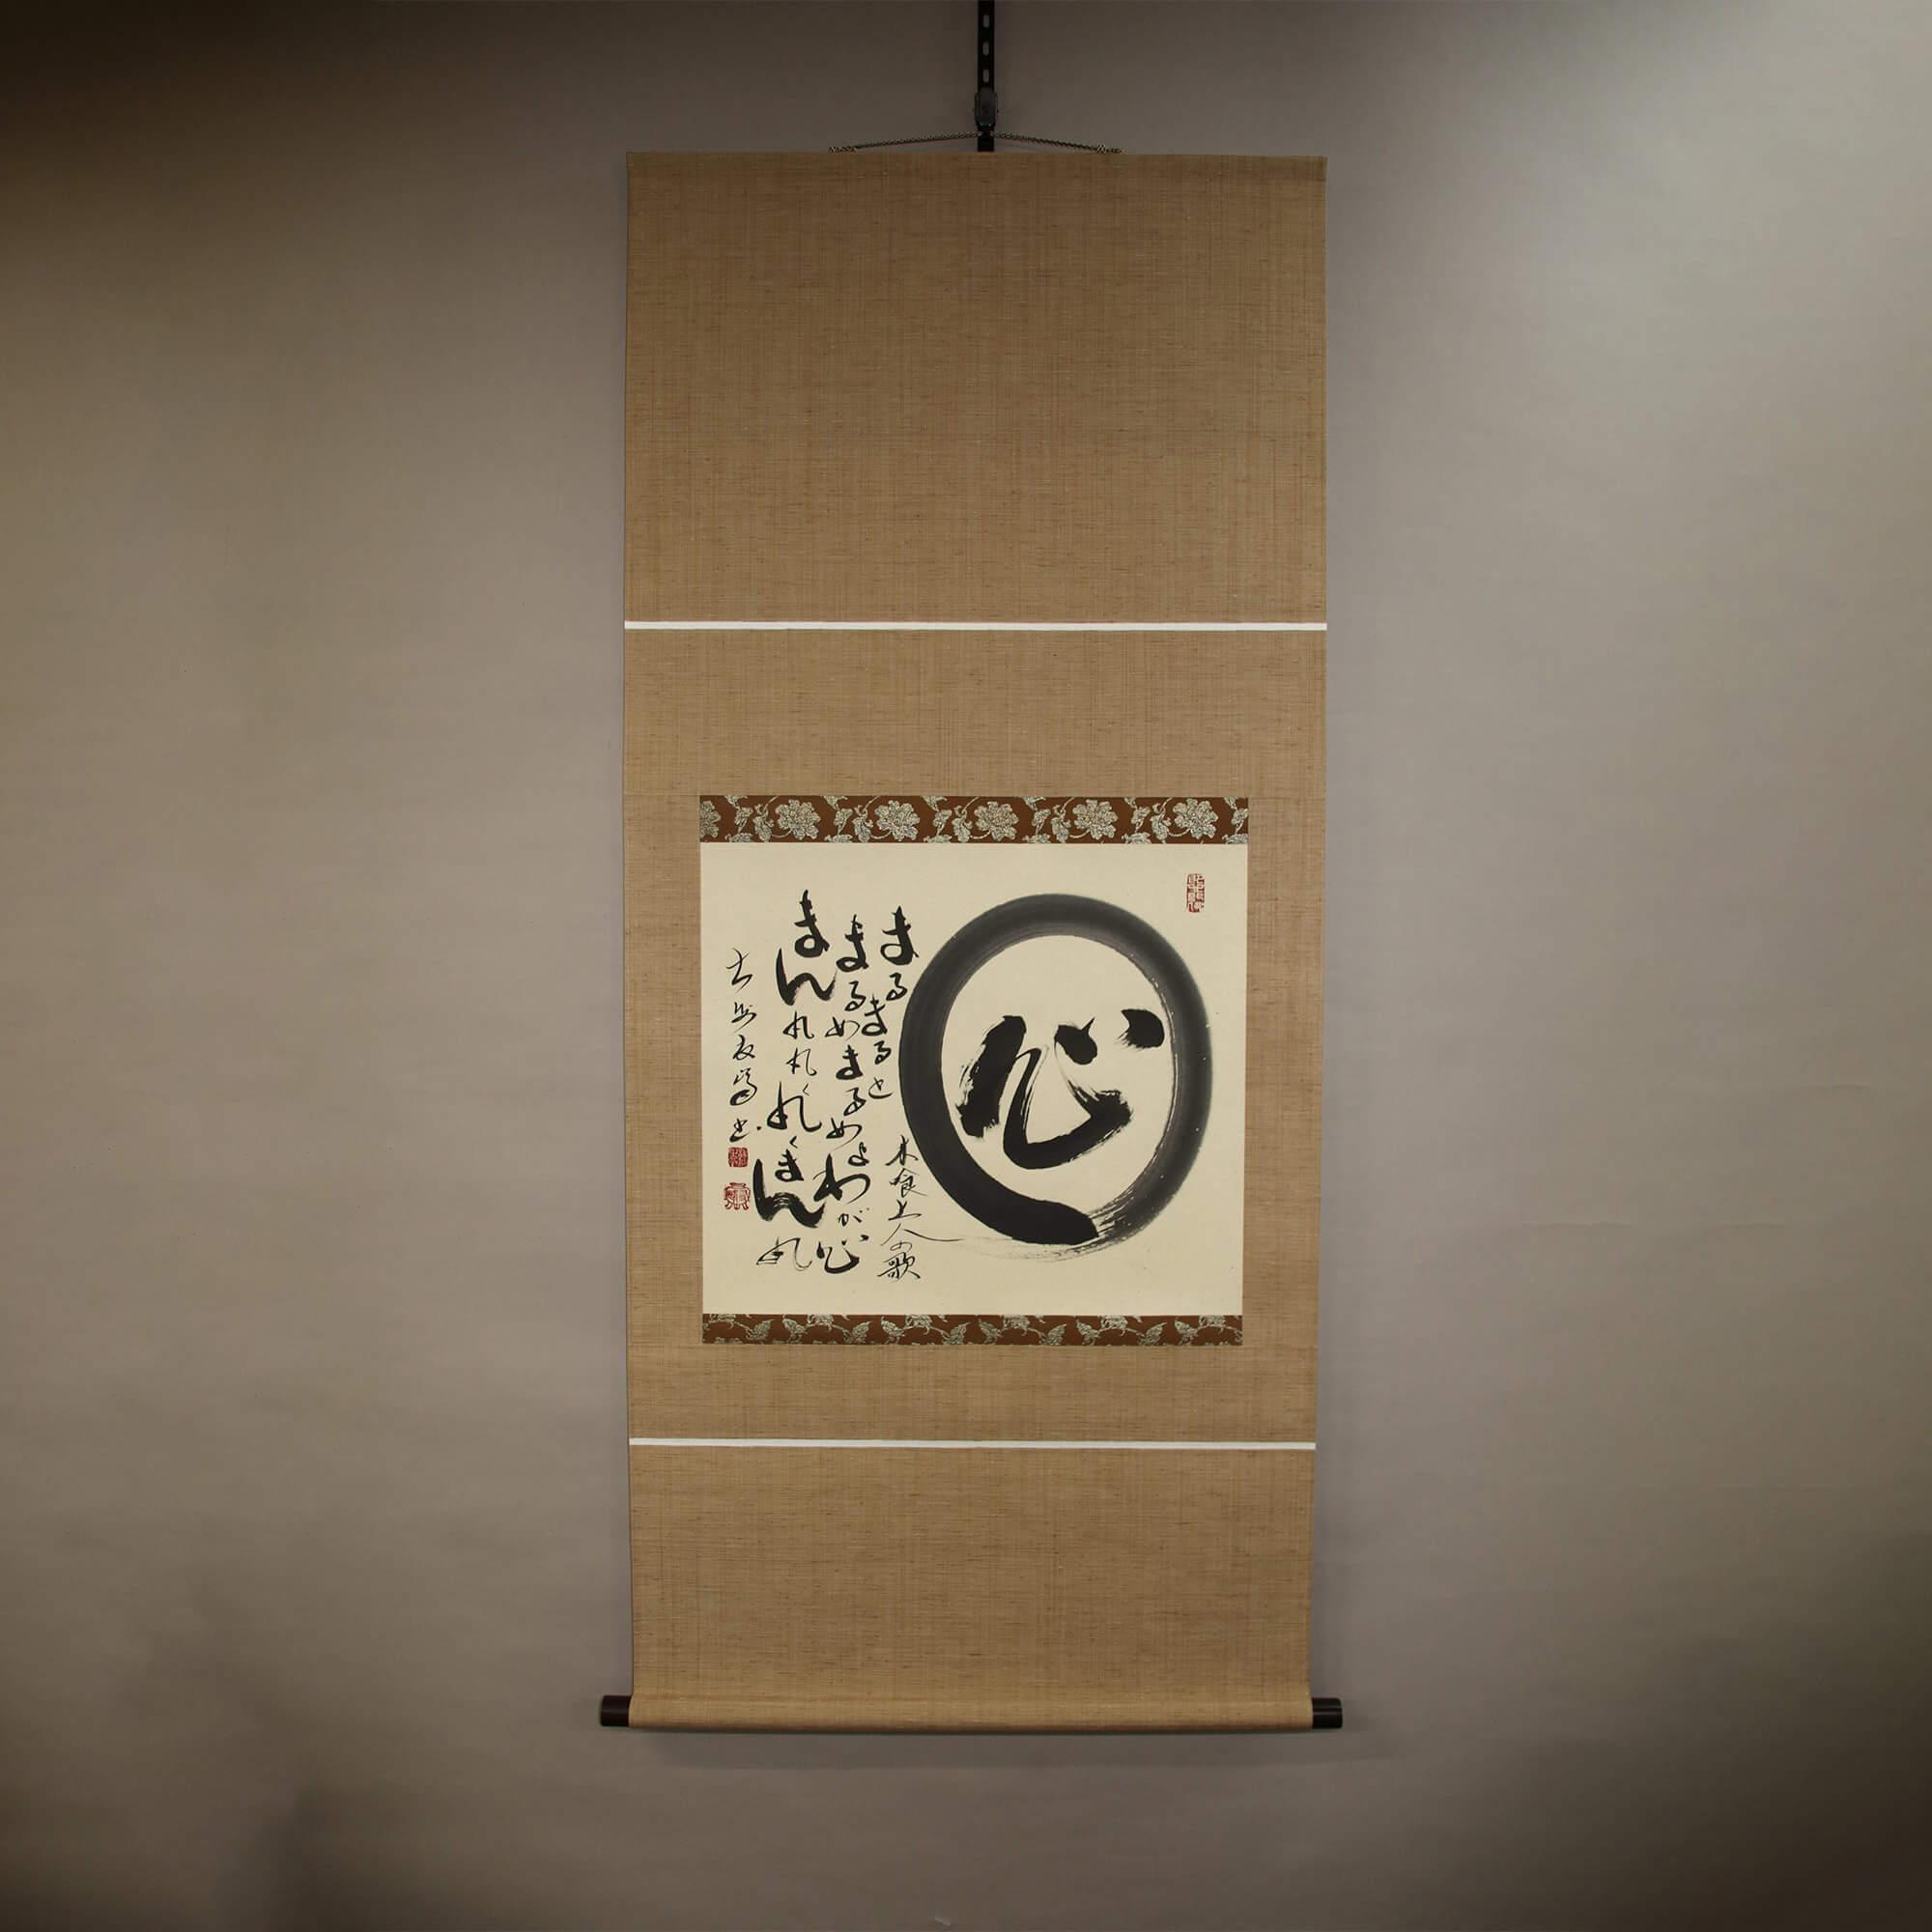 Calligraphy: Round Heart / Takahashi Yūhō